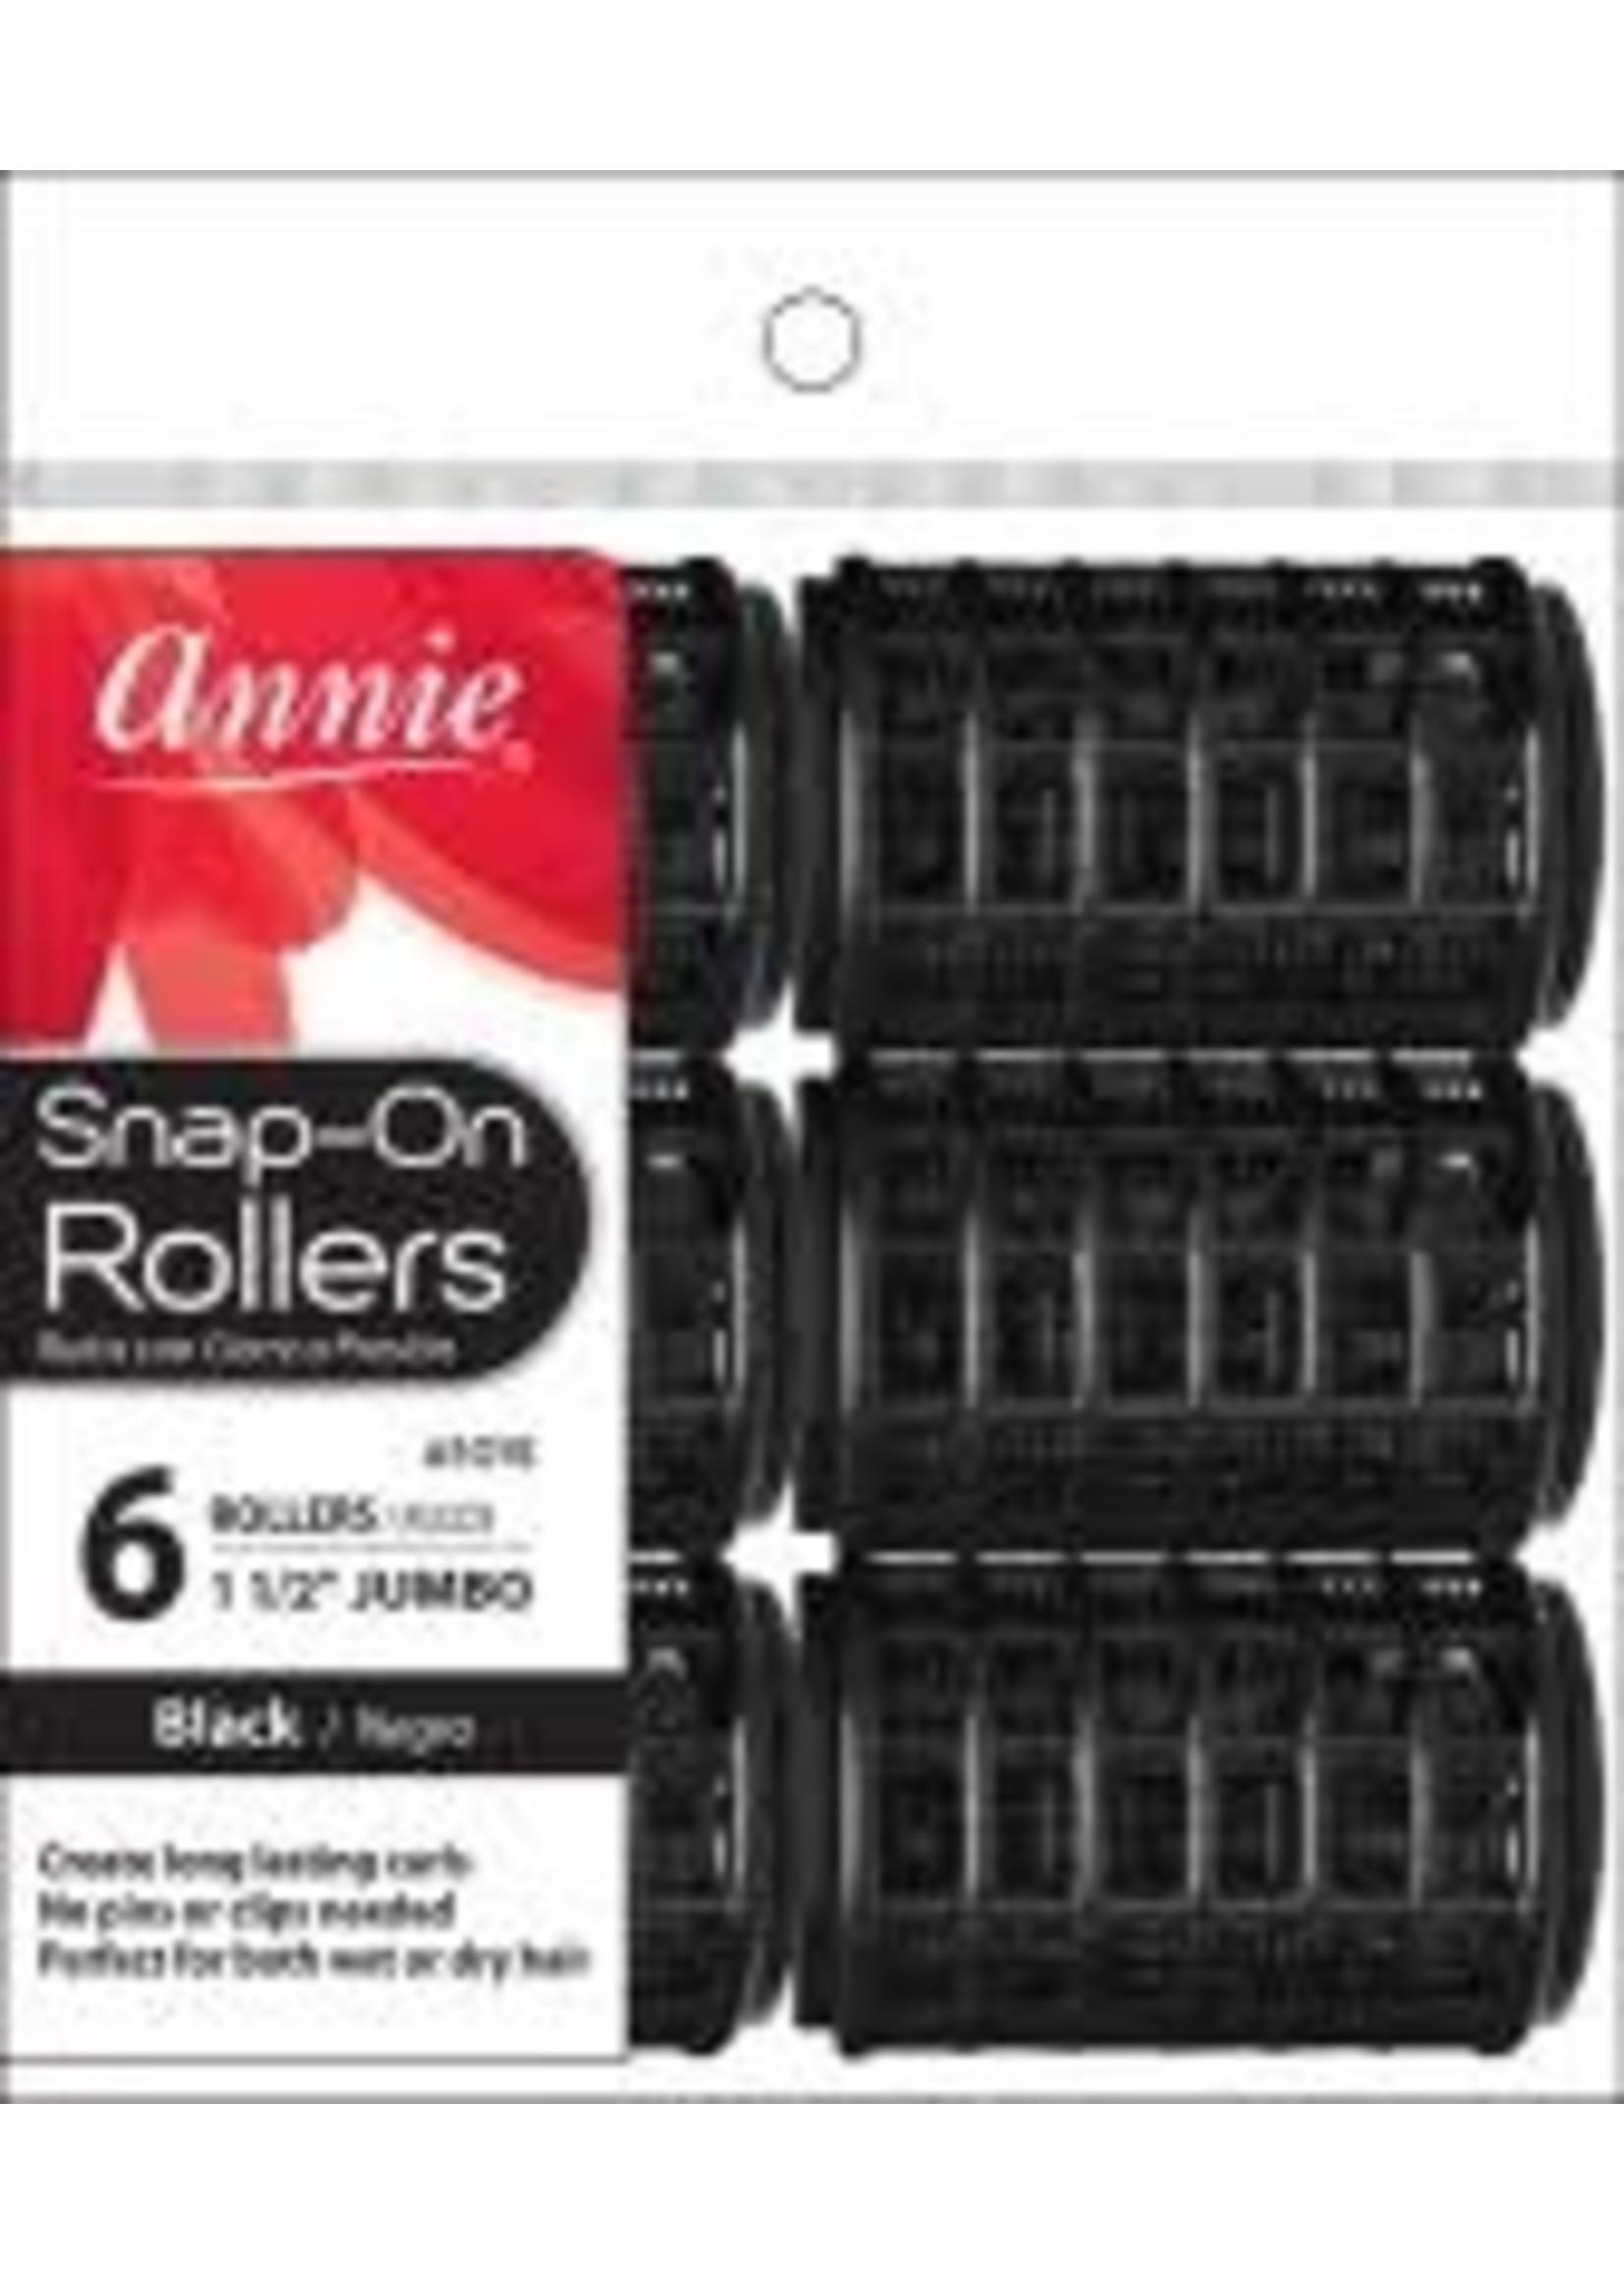 ANNIE ROLLERS SNAP-ON BLACK (JB) 6CT